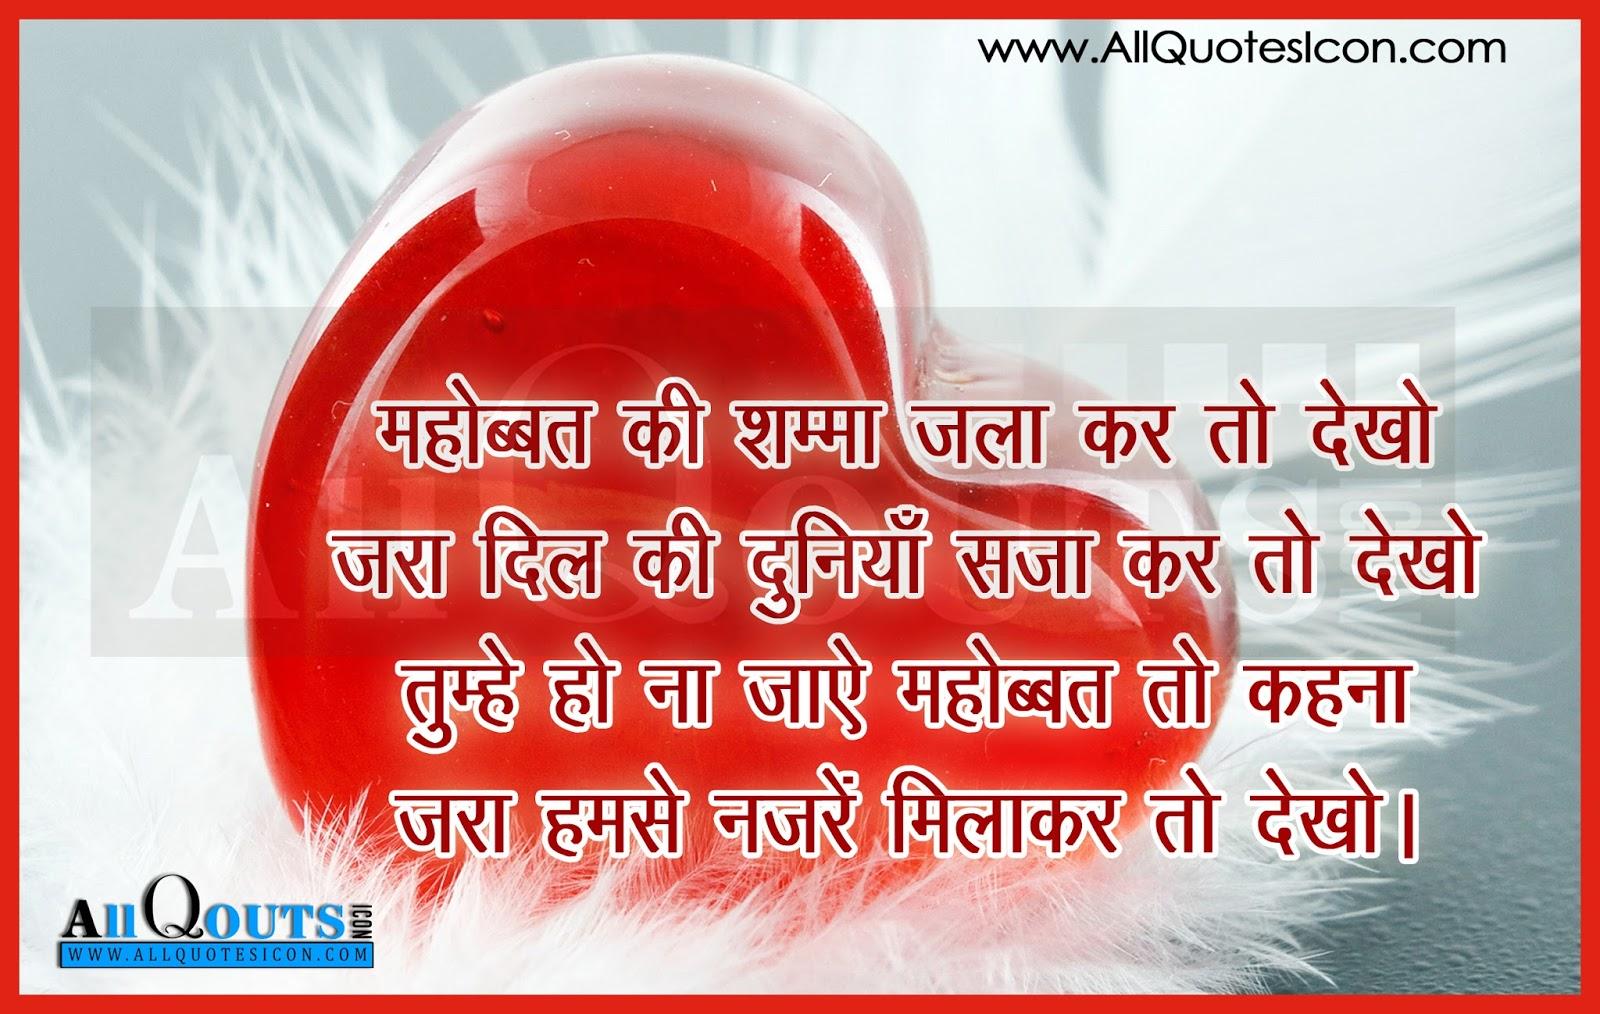 Love Feelings and Sayings in Hindi | www.AllQuotesIcon.com ...